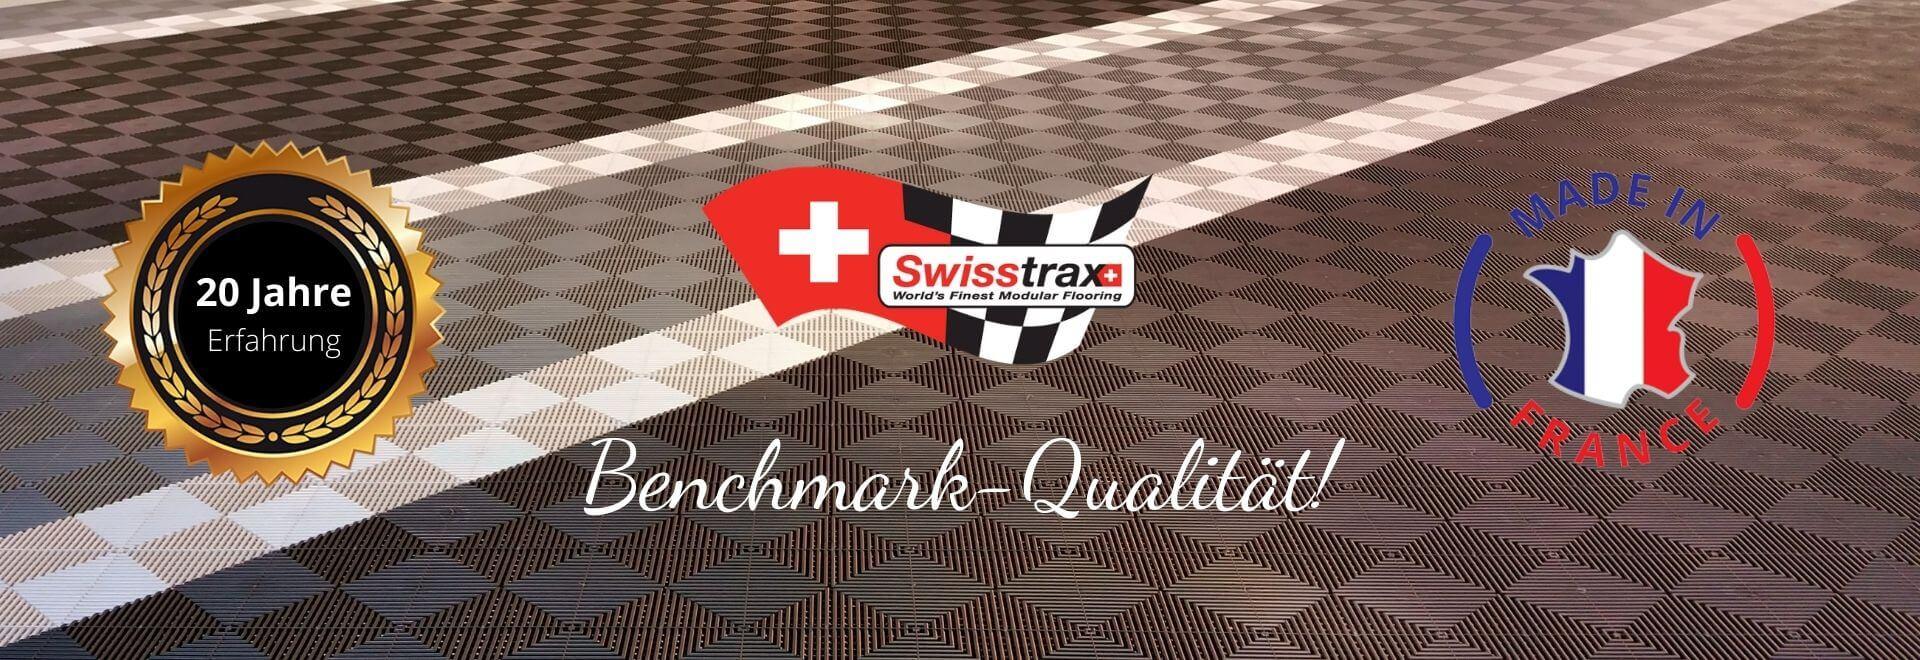 Benchmark-Qualität-swisstrax